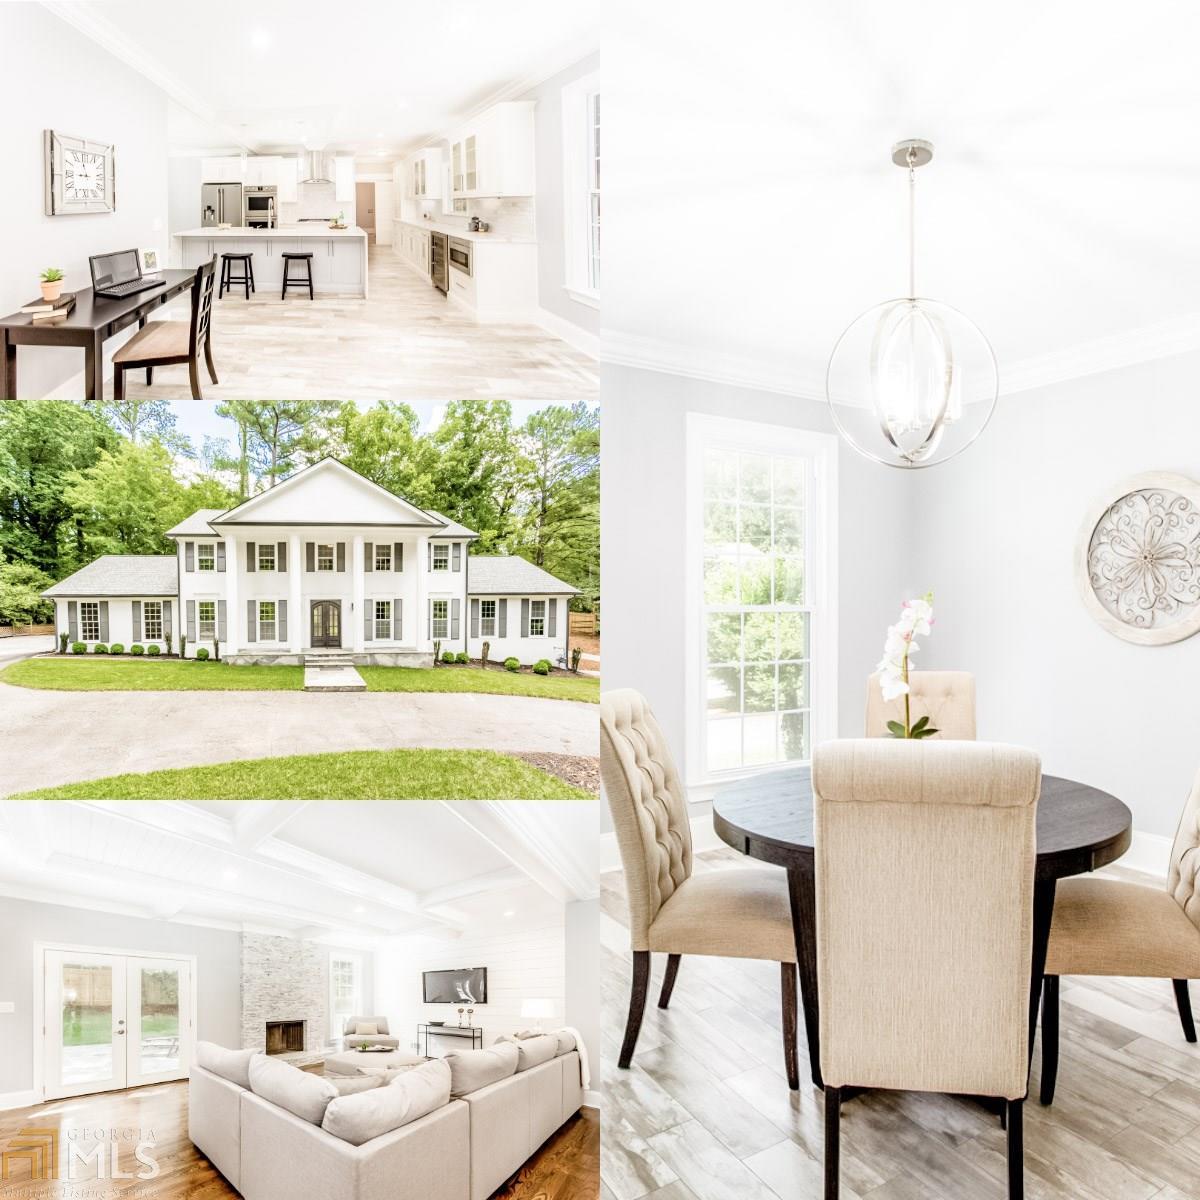 Sensational 4933 Vernon Oaks Dr Dunwoody Ga 30338 Rezide Properties Download Free Architecture Designs Scobabritishbridgeorg